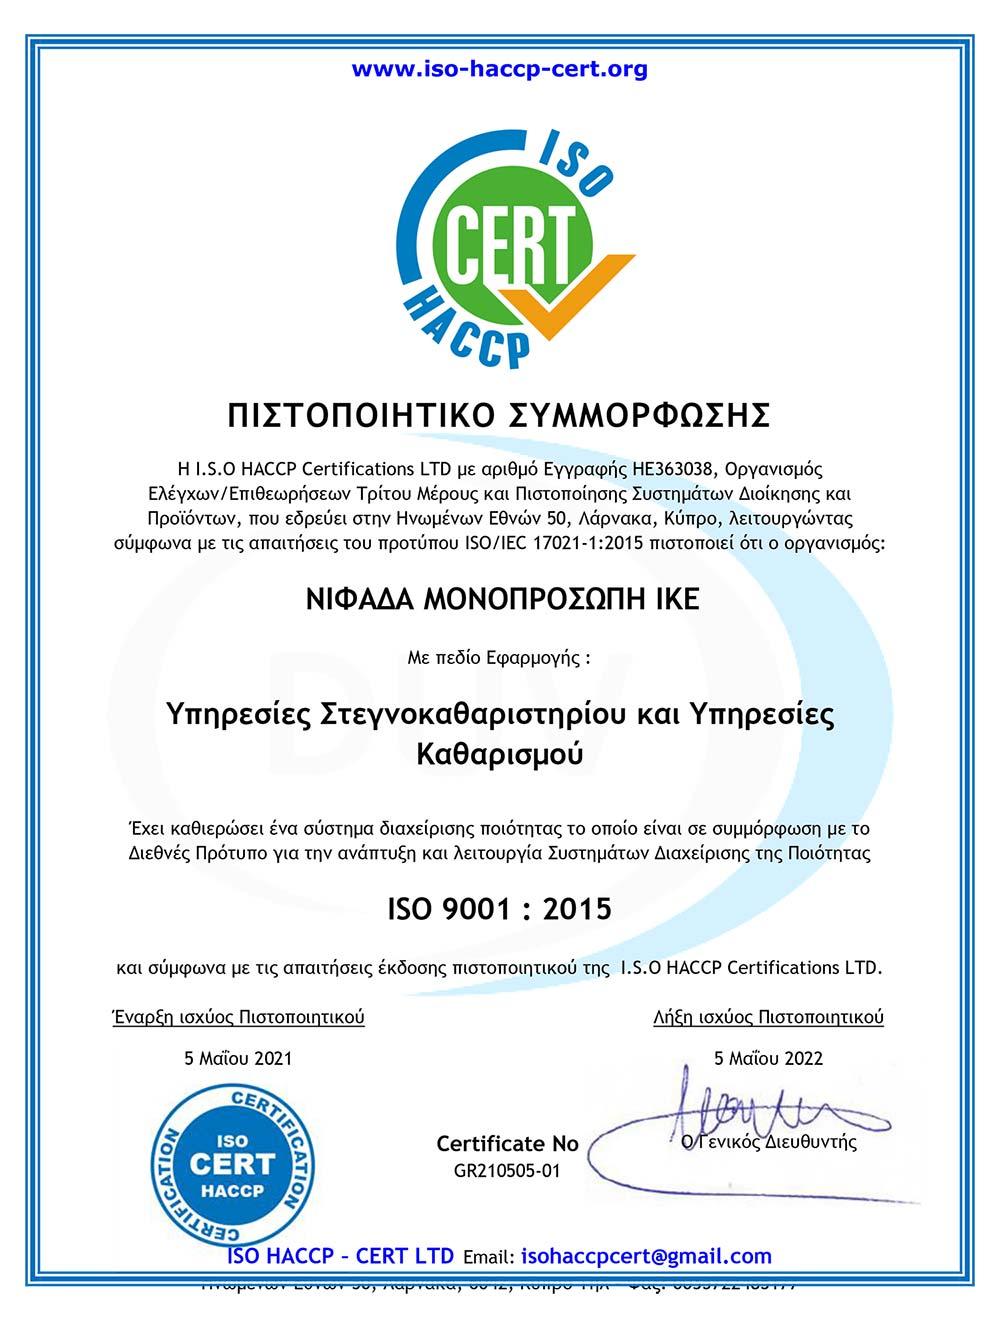 ISO certificate Nifada